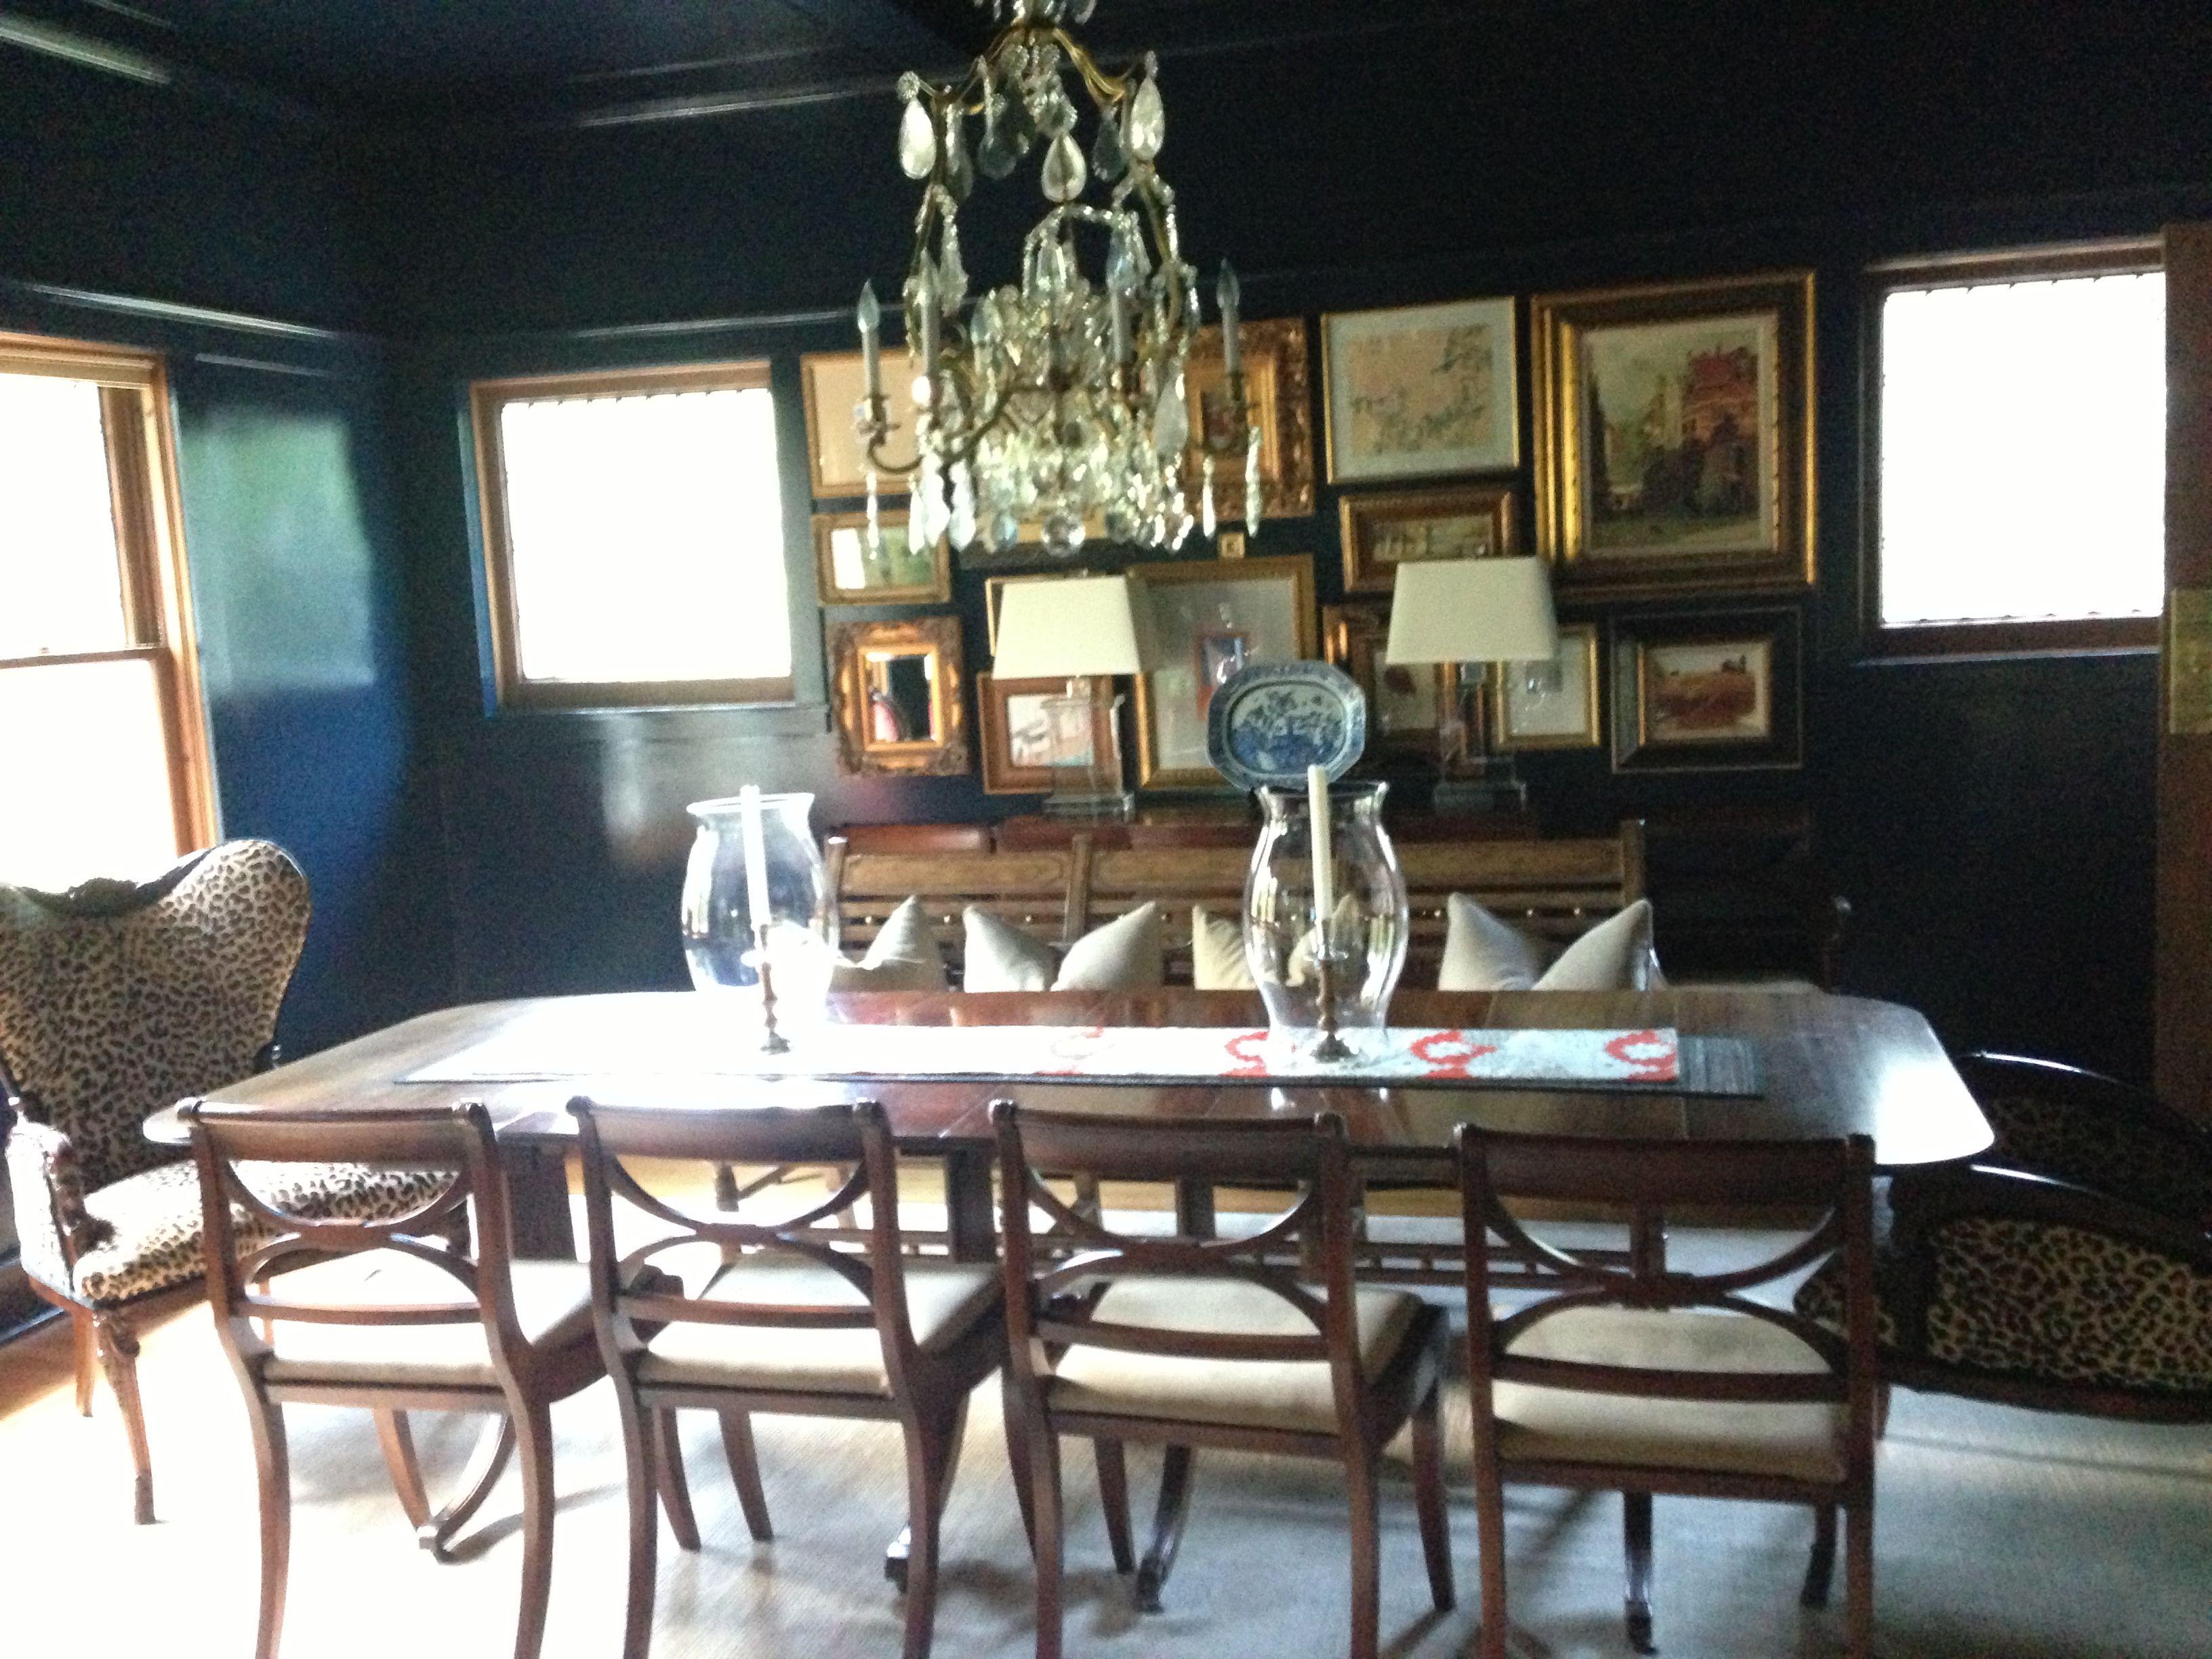 My Ralph Lauren inspired dining room | Dining Room | Pinterest ...